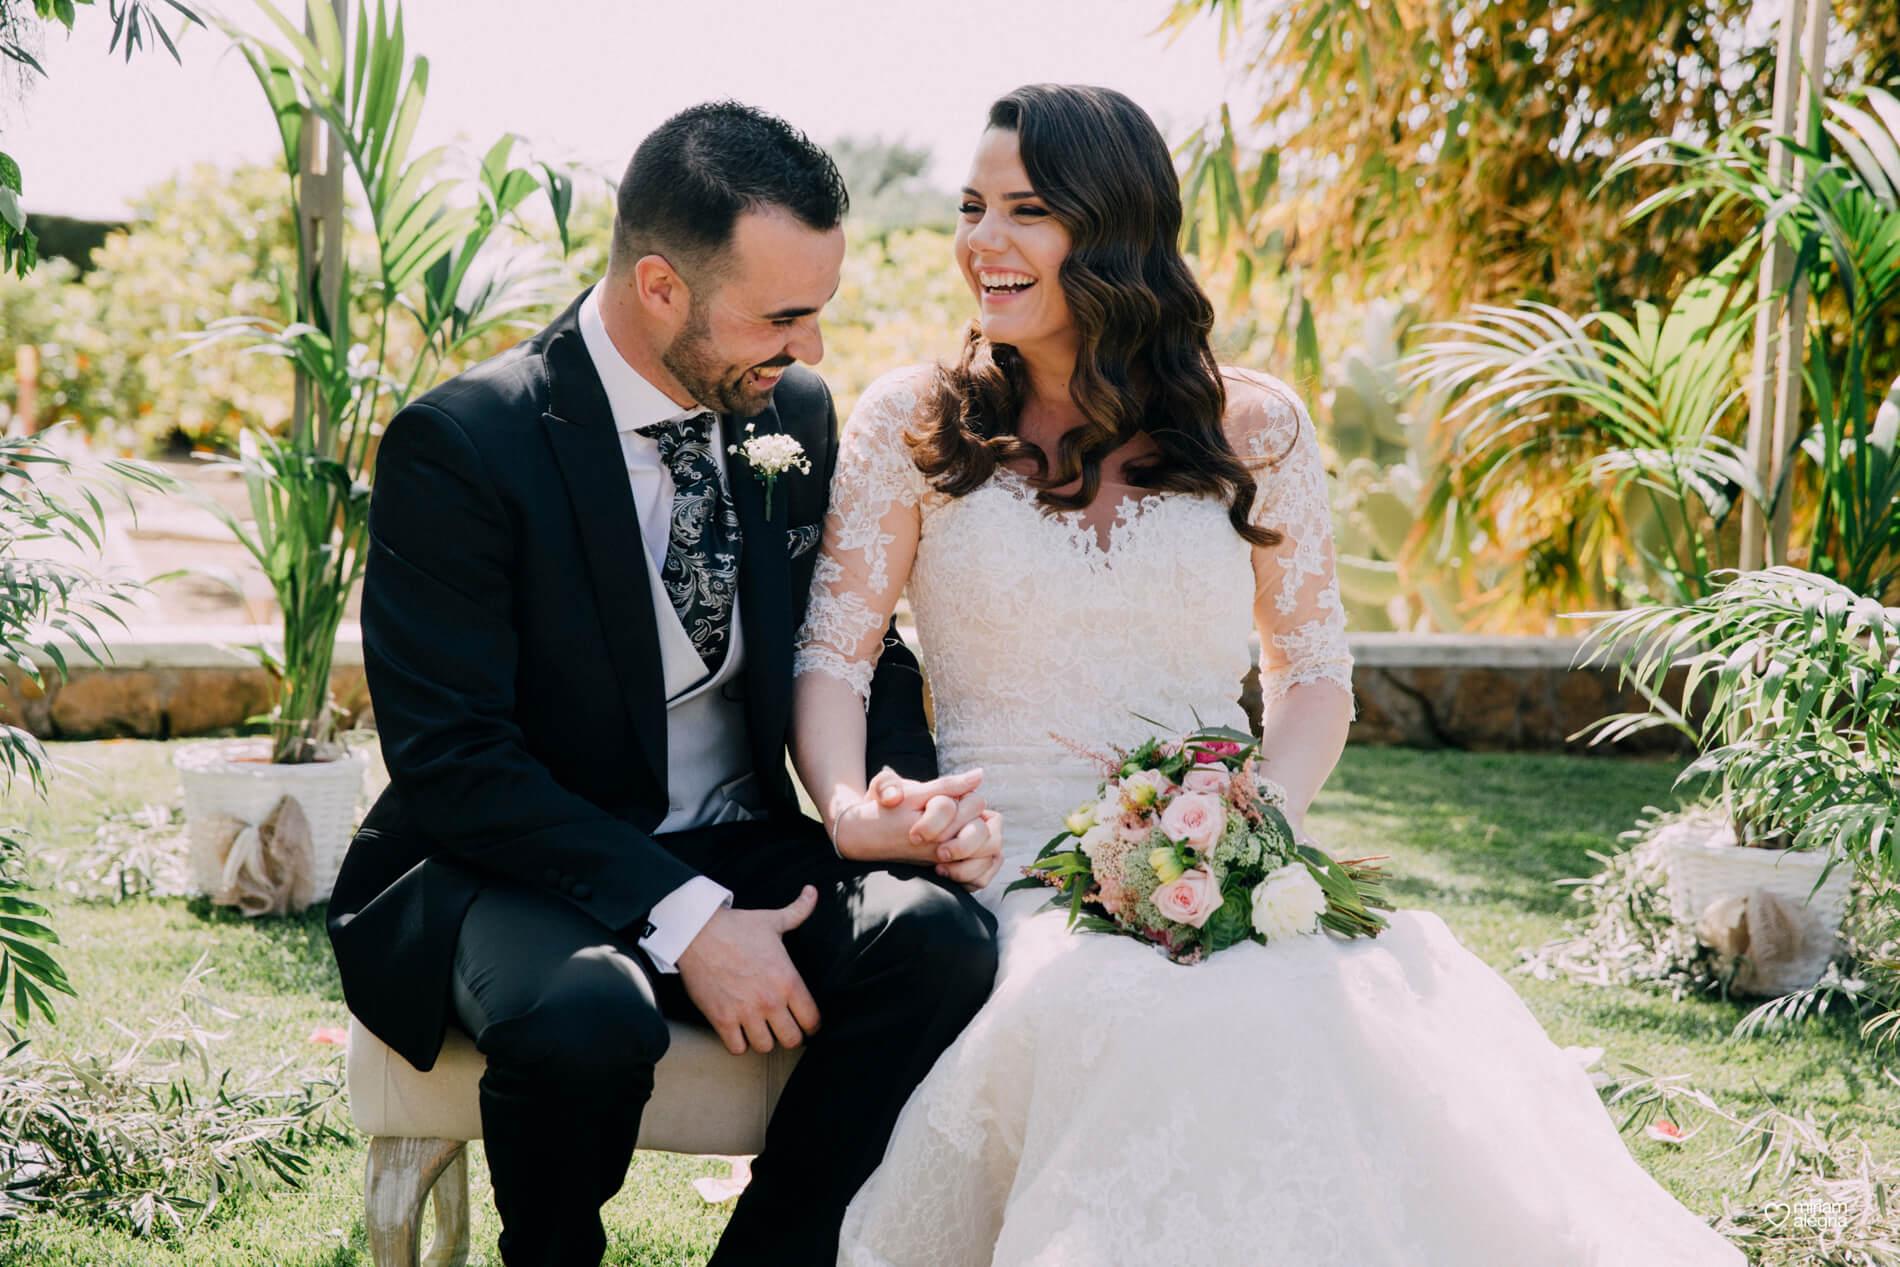 boda-en-finca-jurosa-miriam-alegria-61